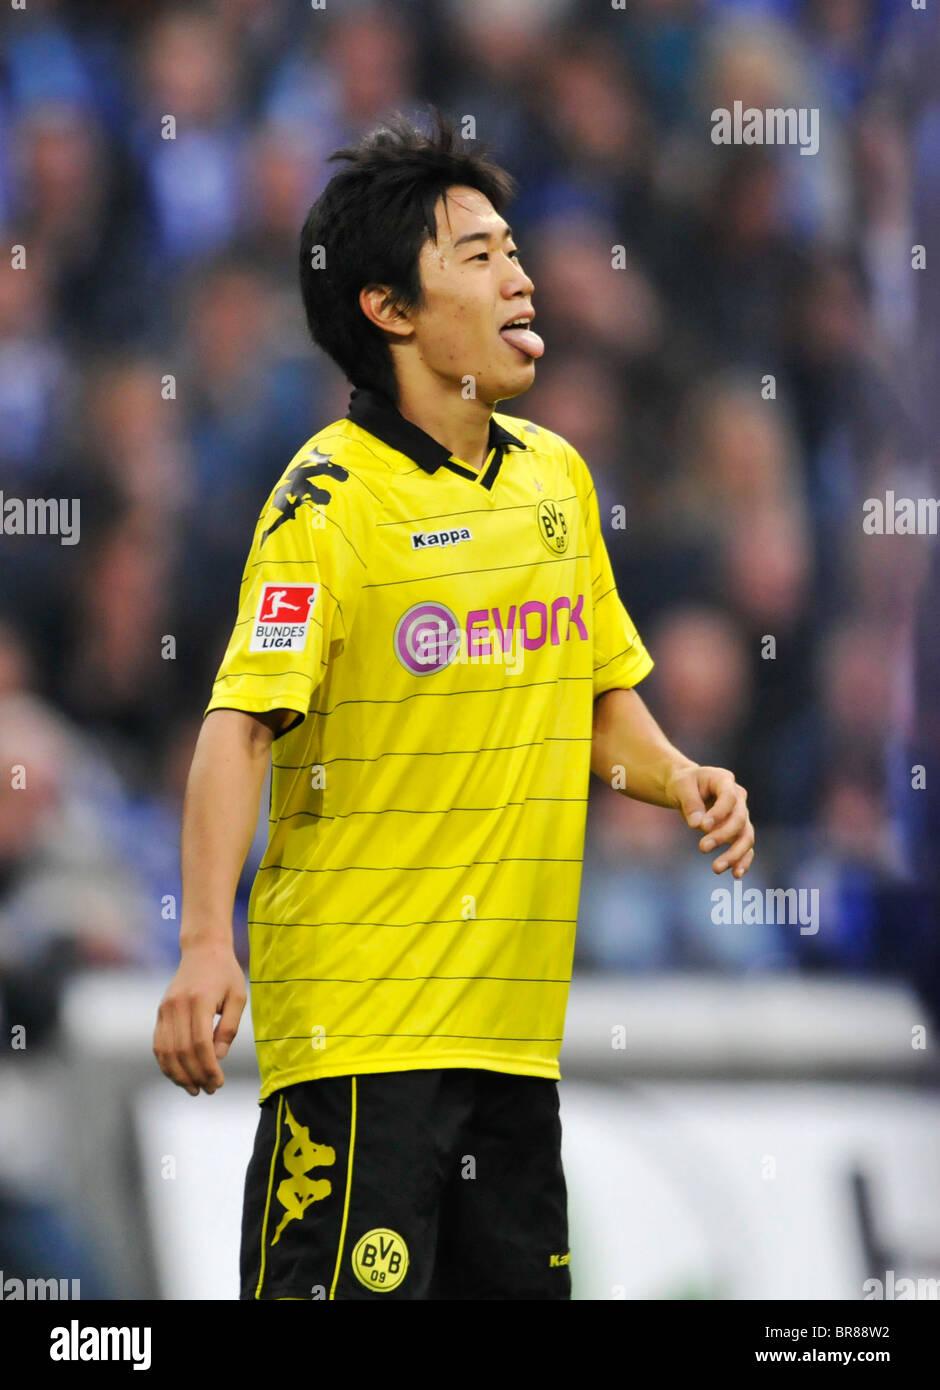 Shinji KAGAWA of Dortmund sticks out his tongue during the